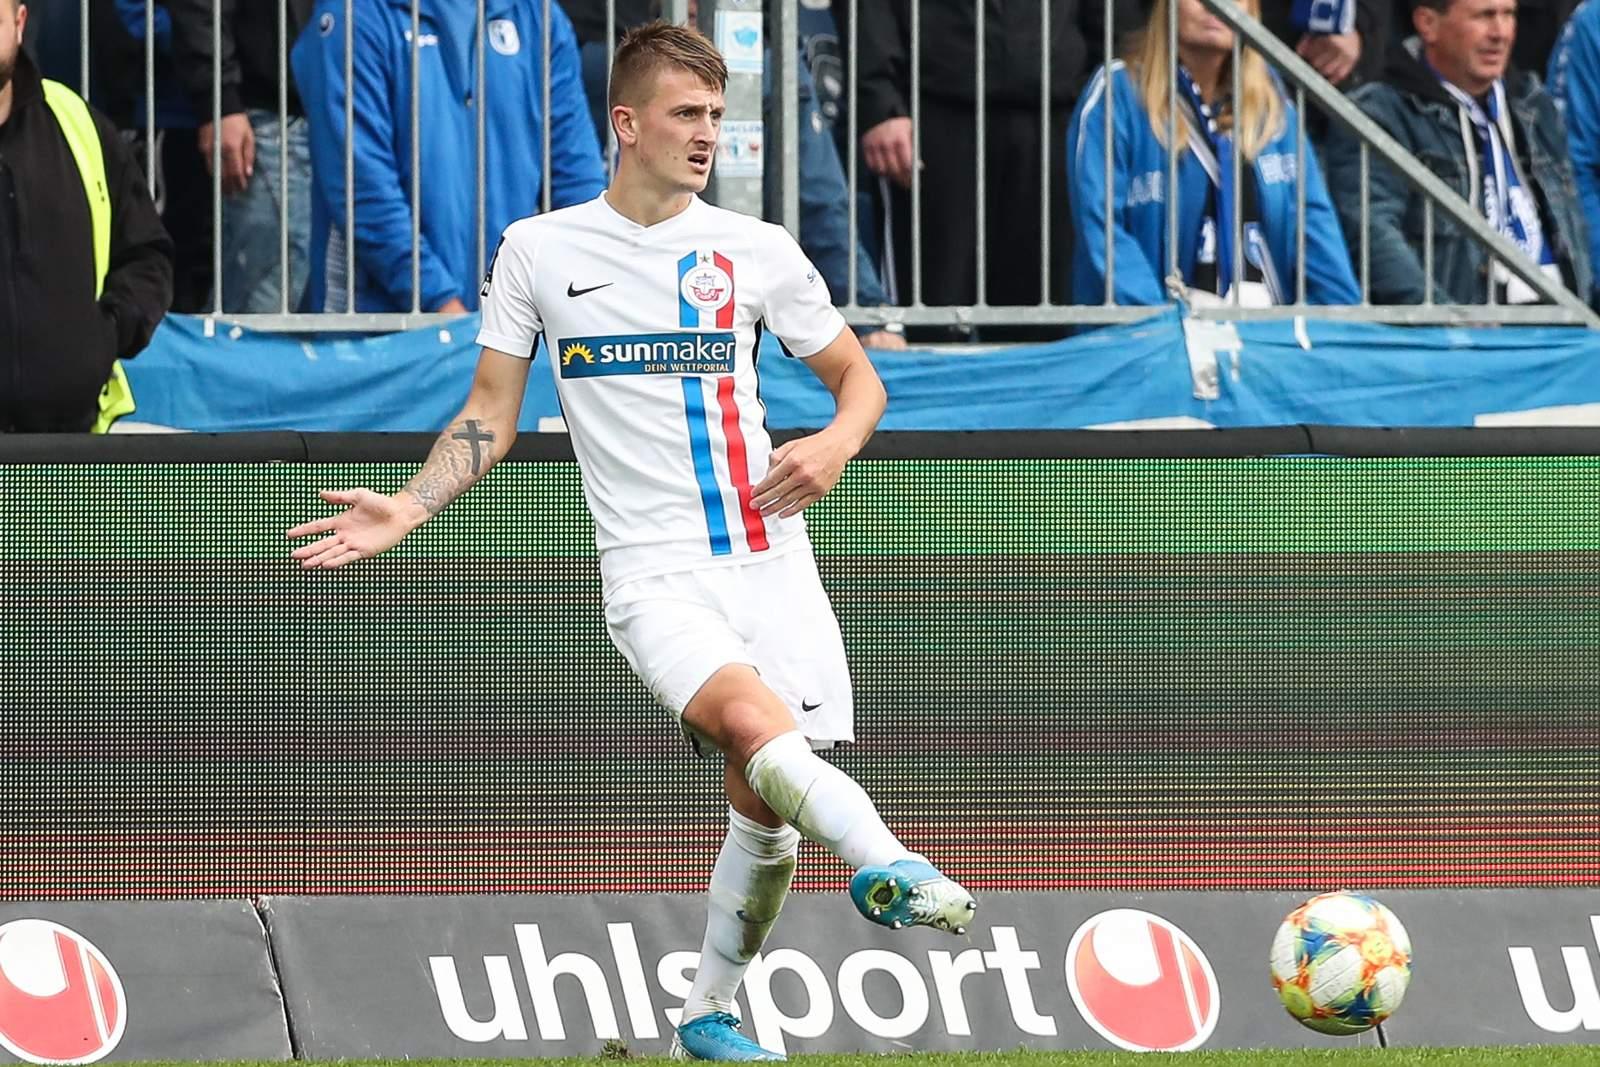 Nico Neidhart von Hansa Rostock